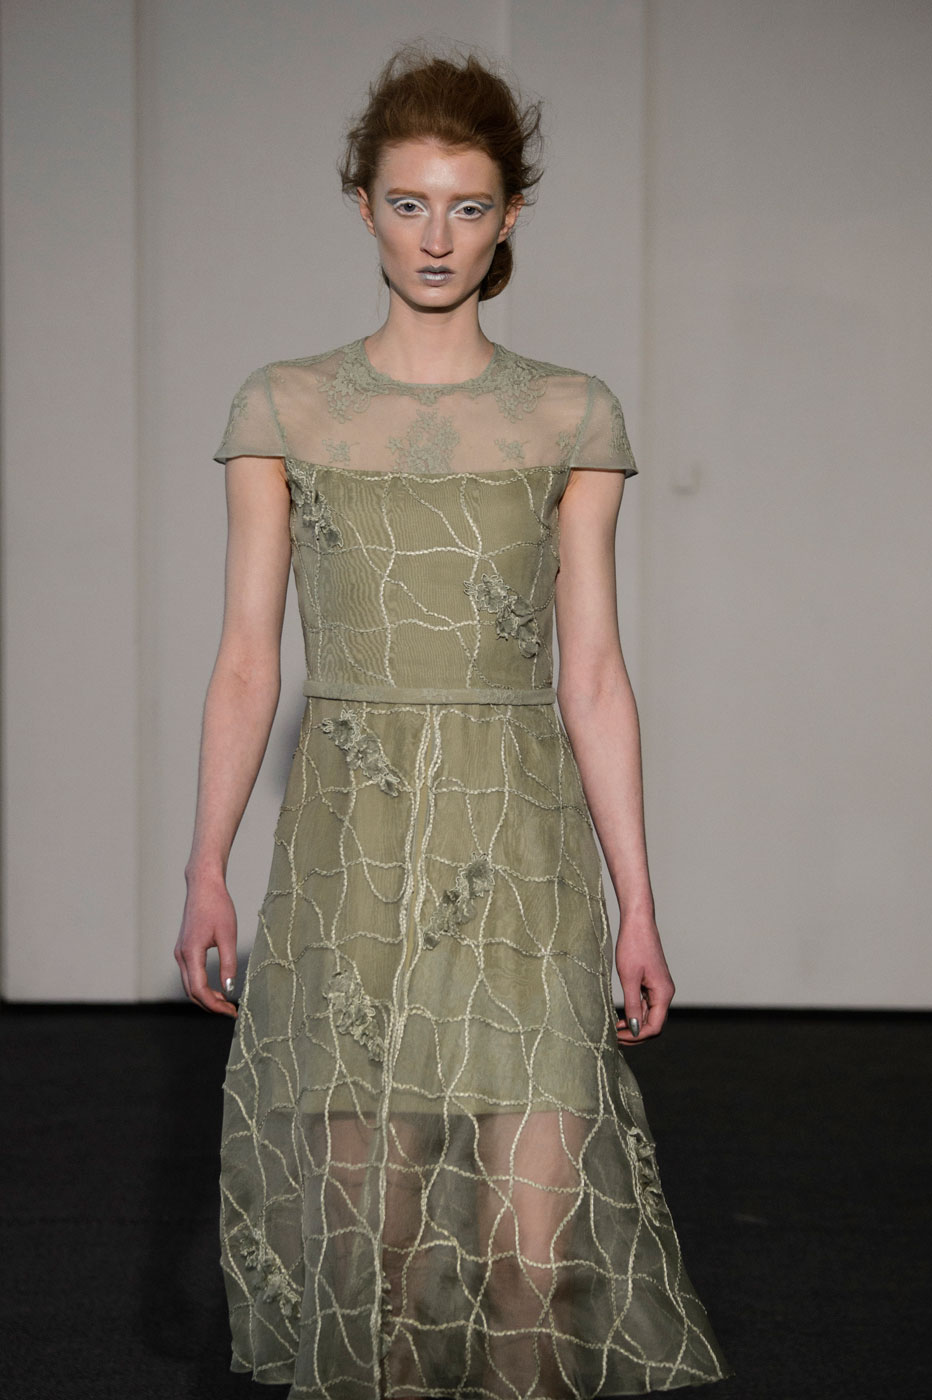 Busardi-fashion-runway-show-haute-couture-paris-spring-2015-the-impression-17